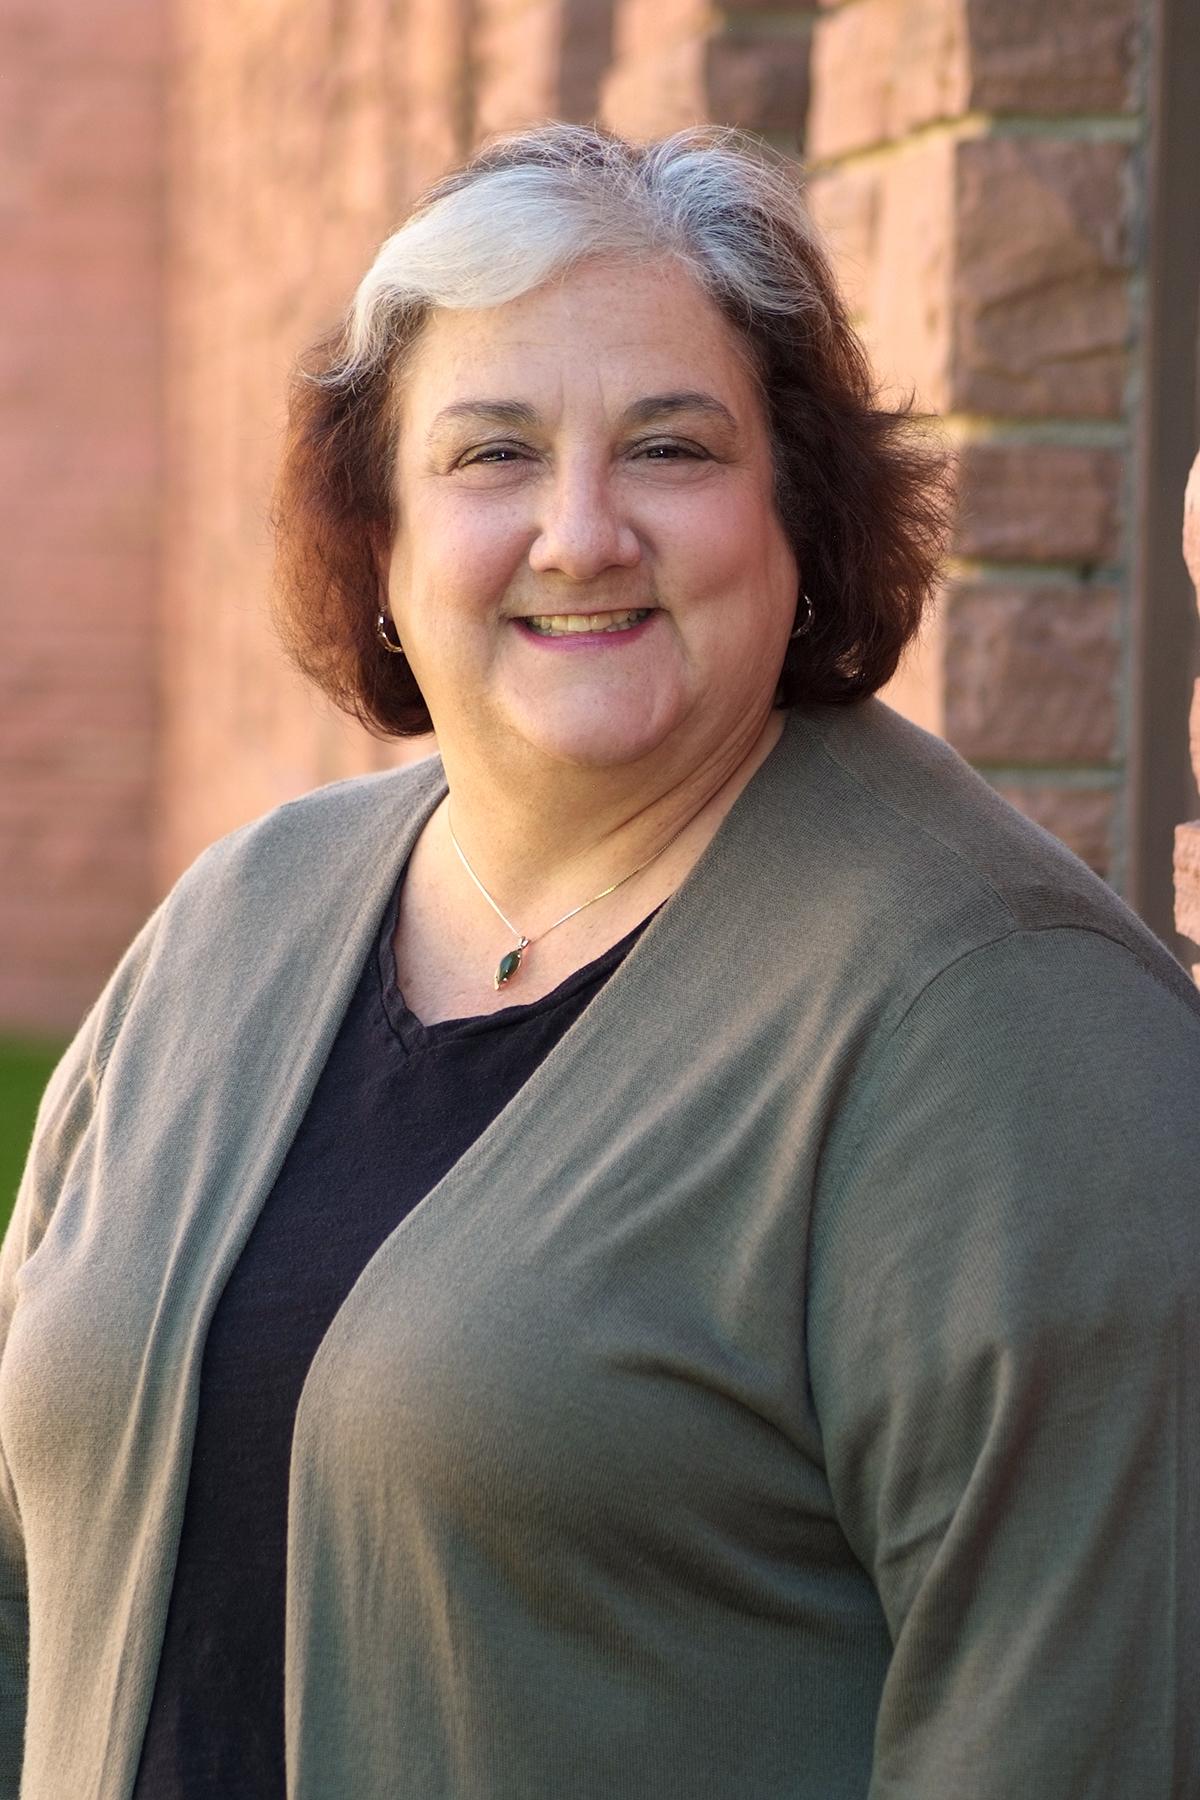 Francie Miran, Development Manager